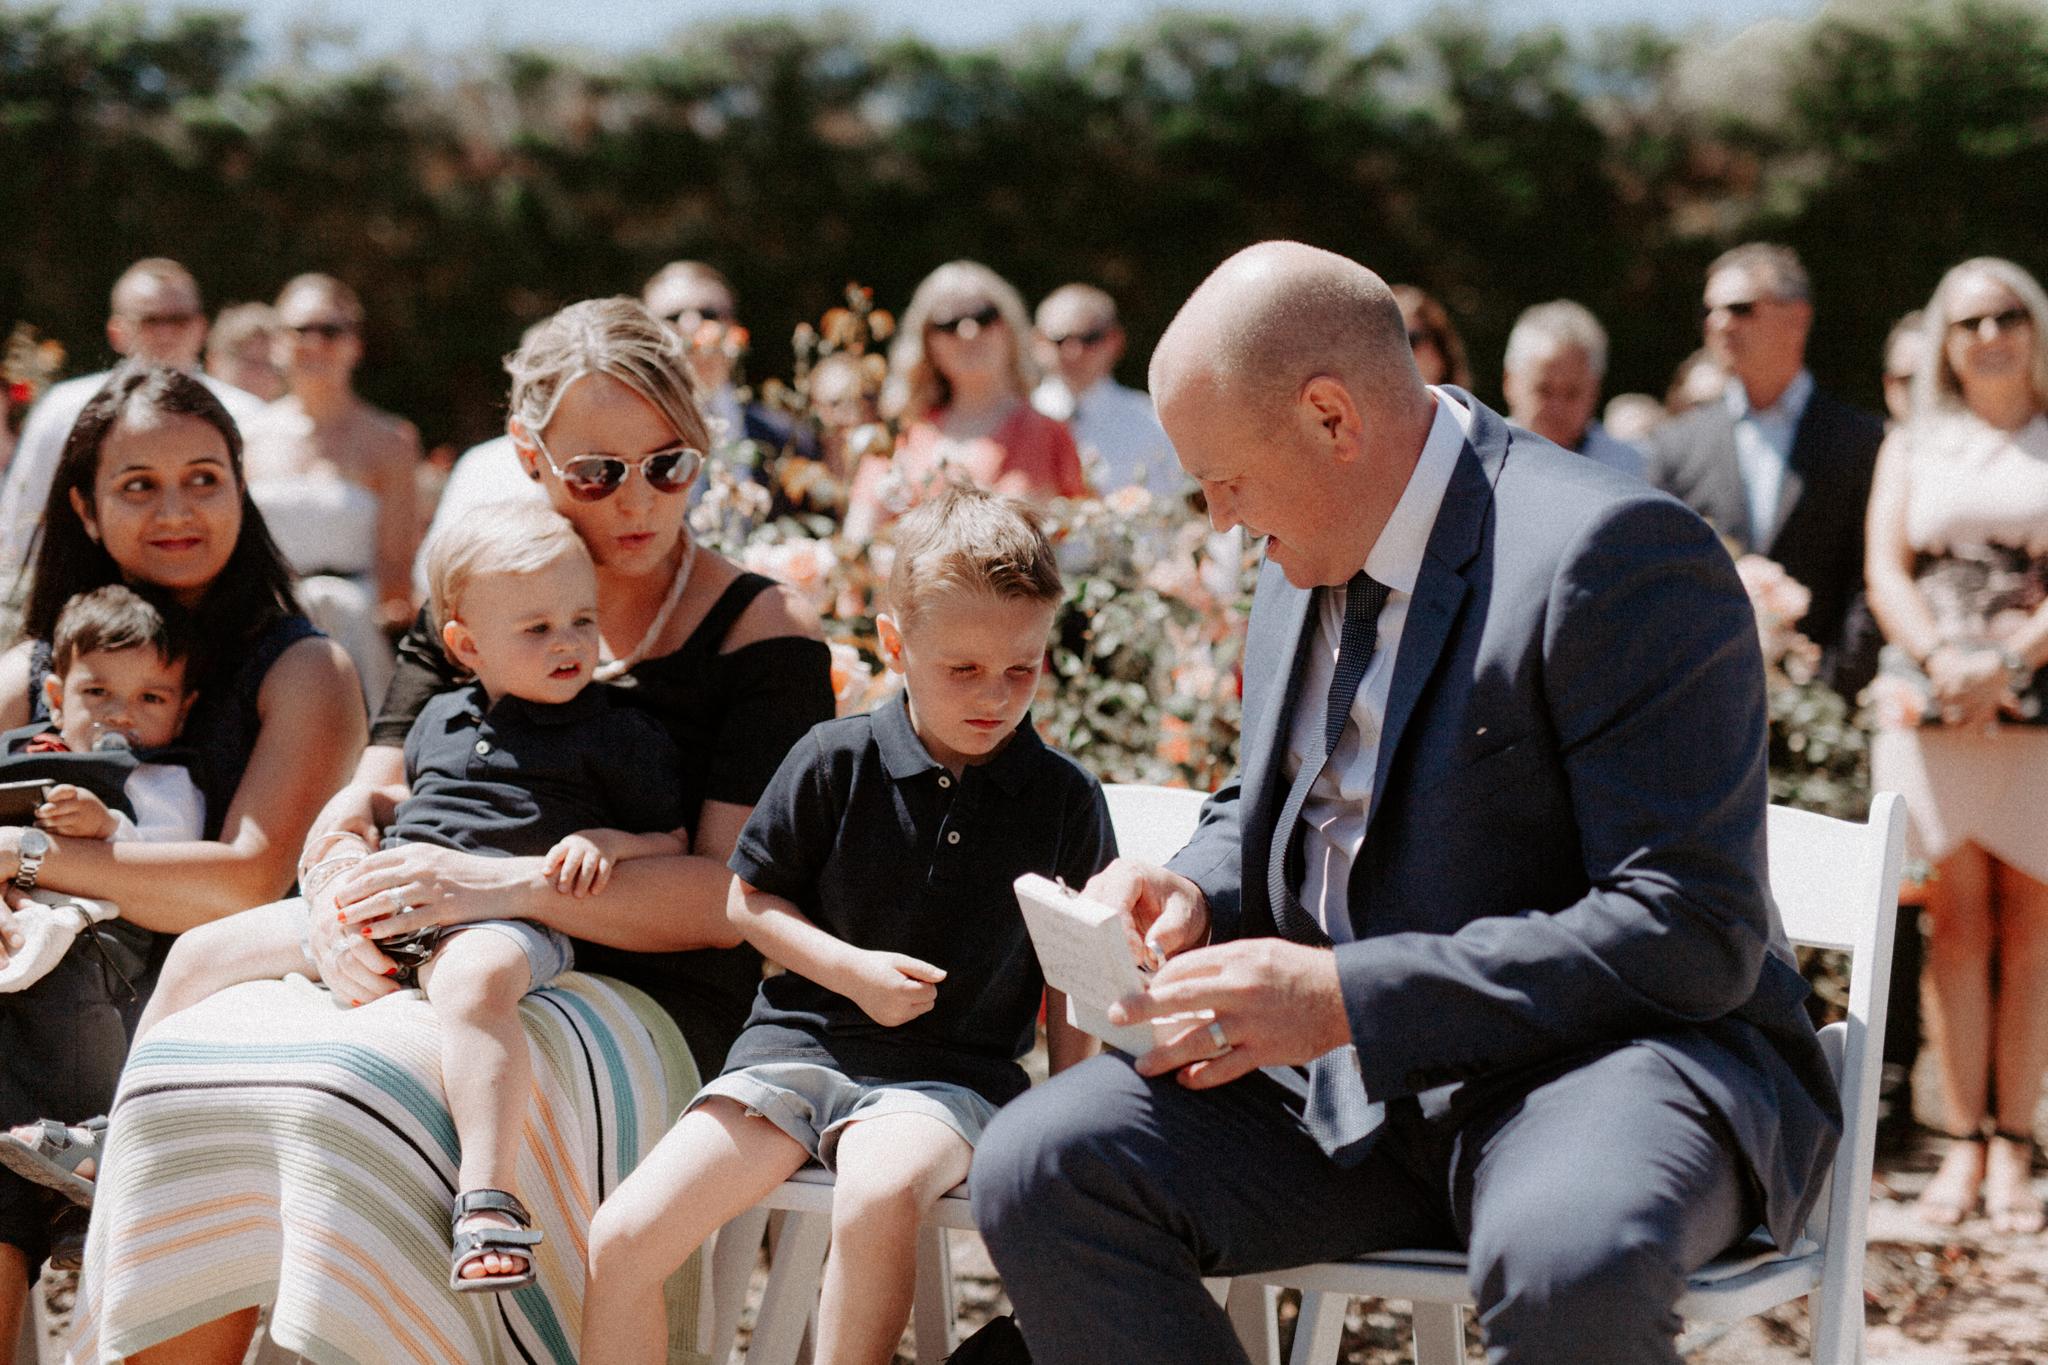 St-Kilda-Garden-Wedding-Emotions-and-Math-Photograph-056.jpg